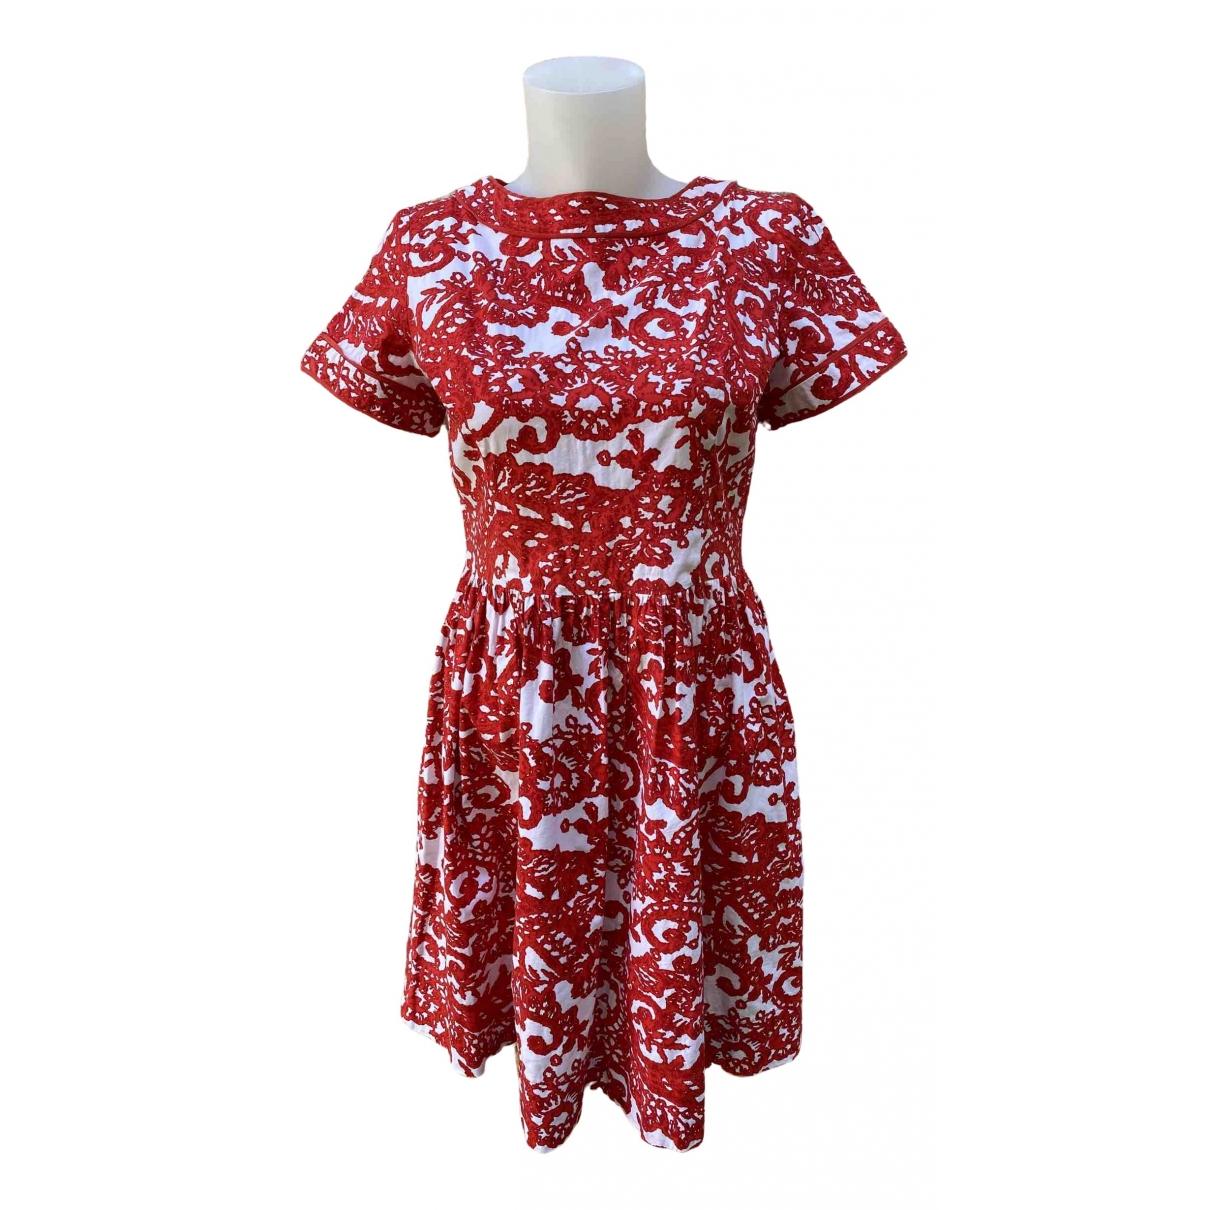 Oscar De La Renta - Robe   pour femme en coton - elasthane - rouge